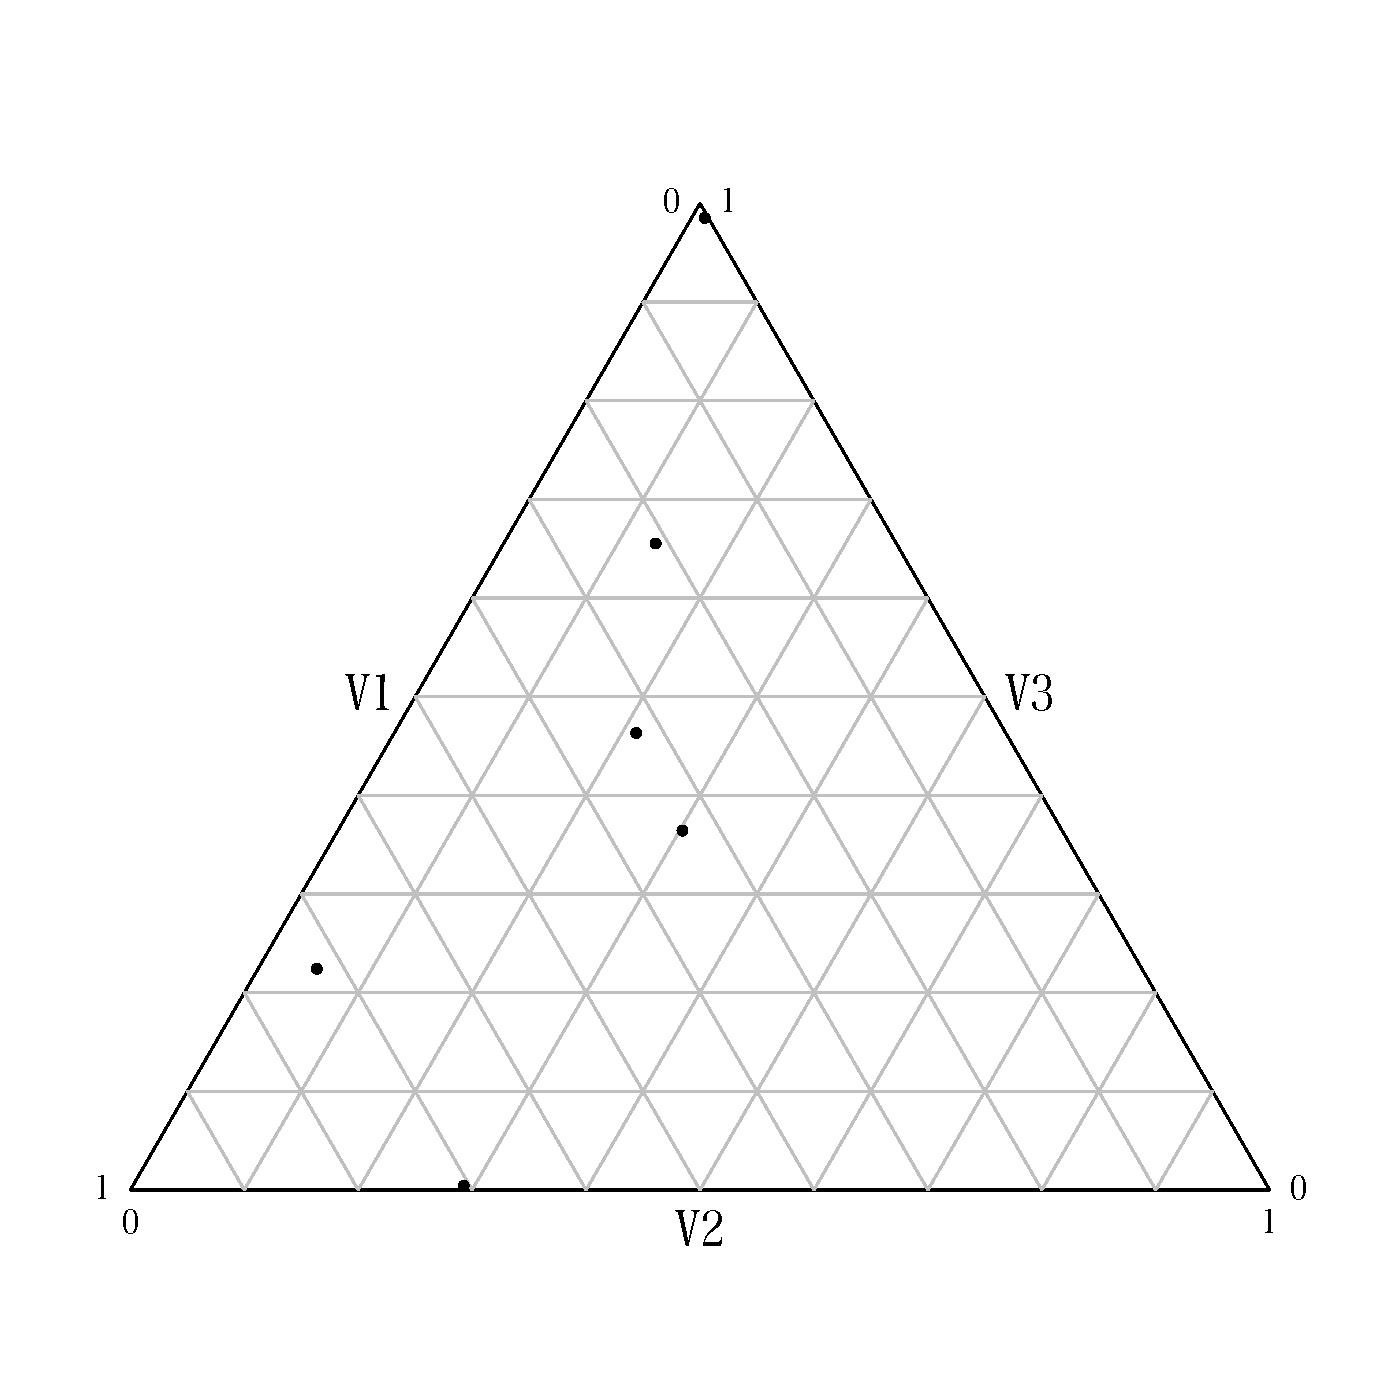 drawing ternary diagrams  ternary plots